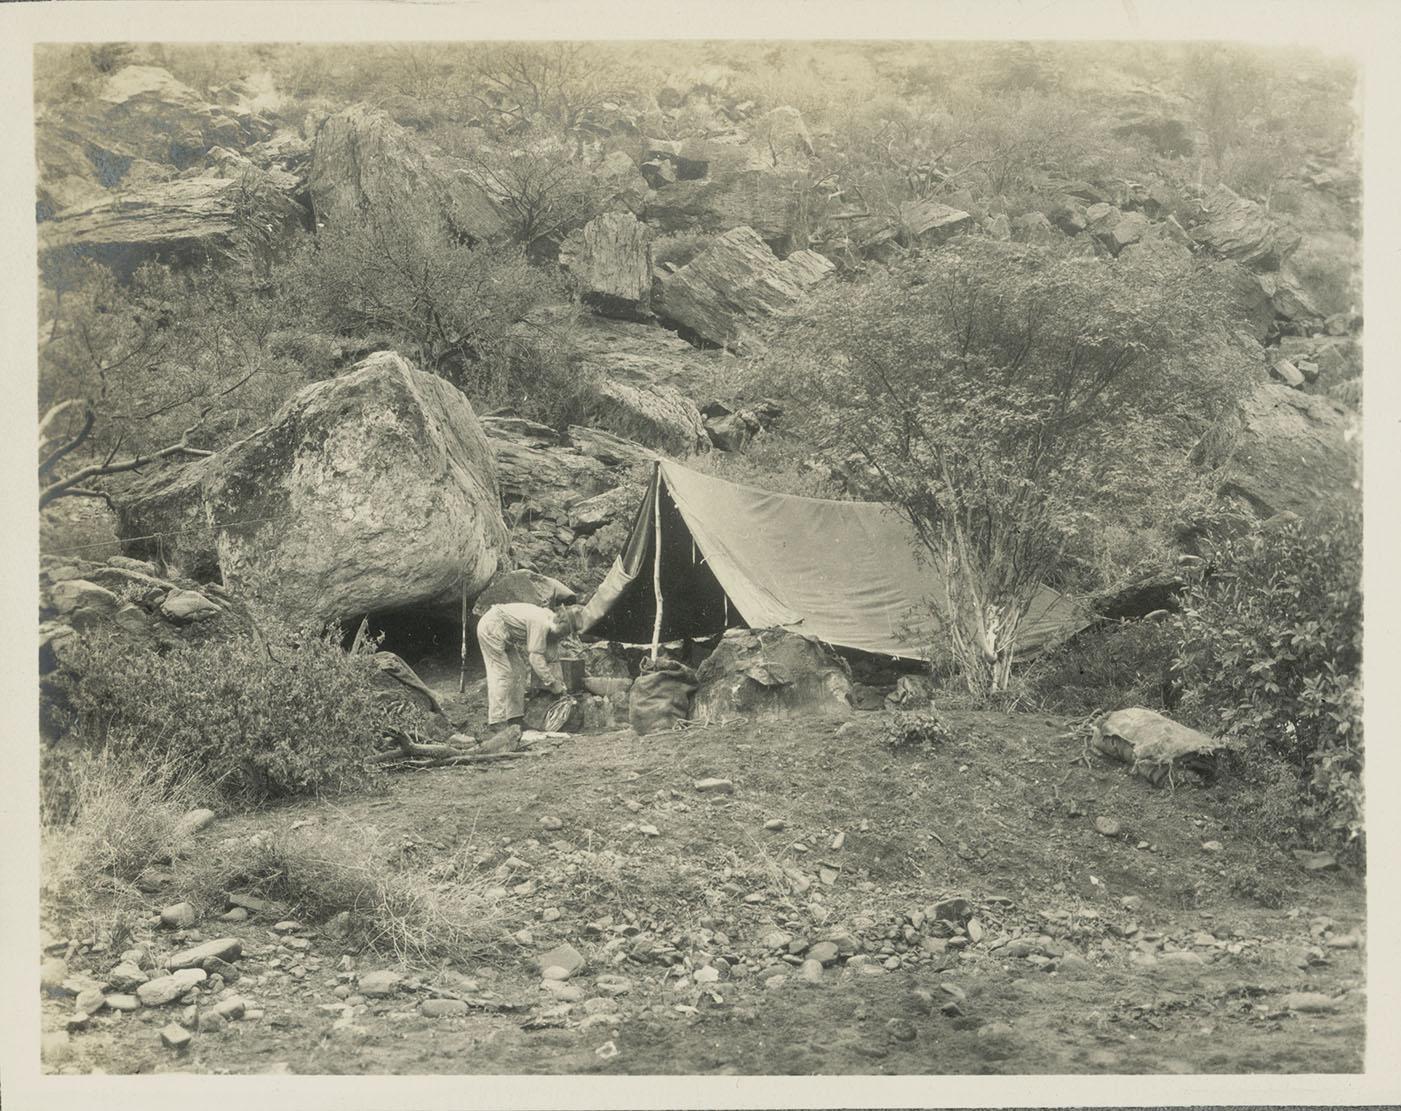 Camp 18 miles west of Santa Rosalia.jpg